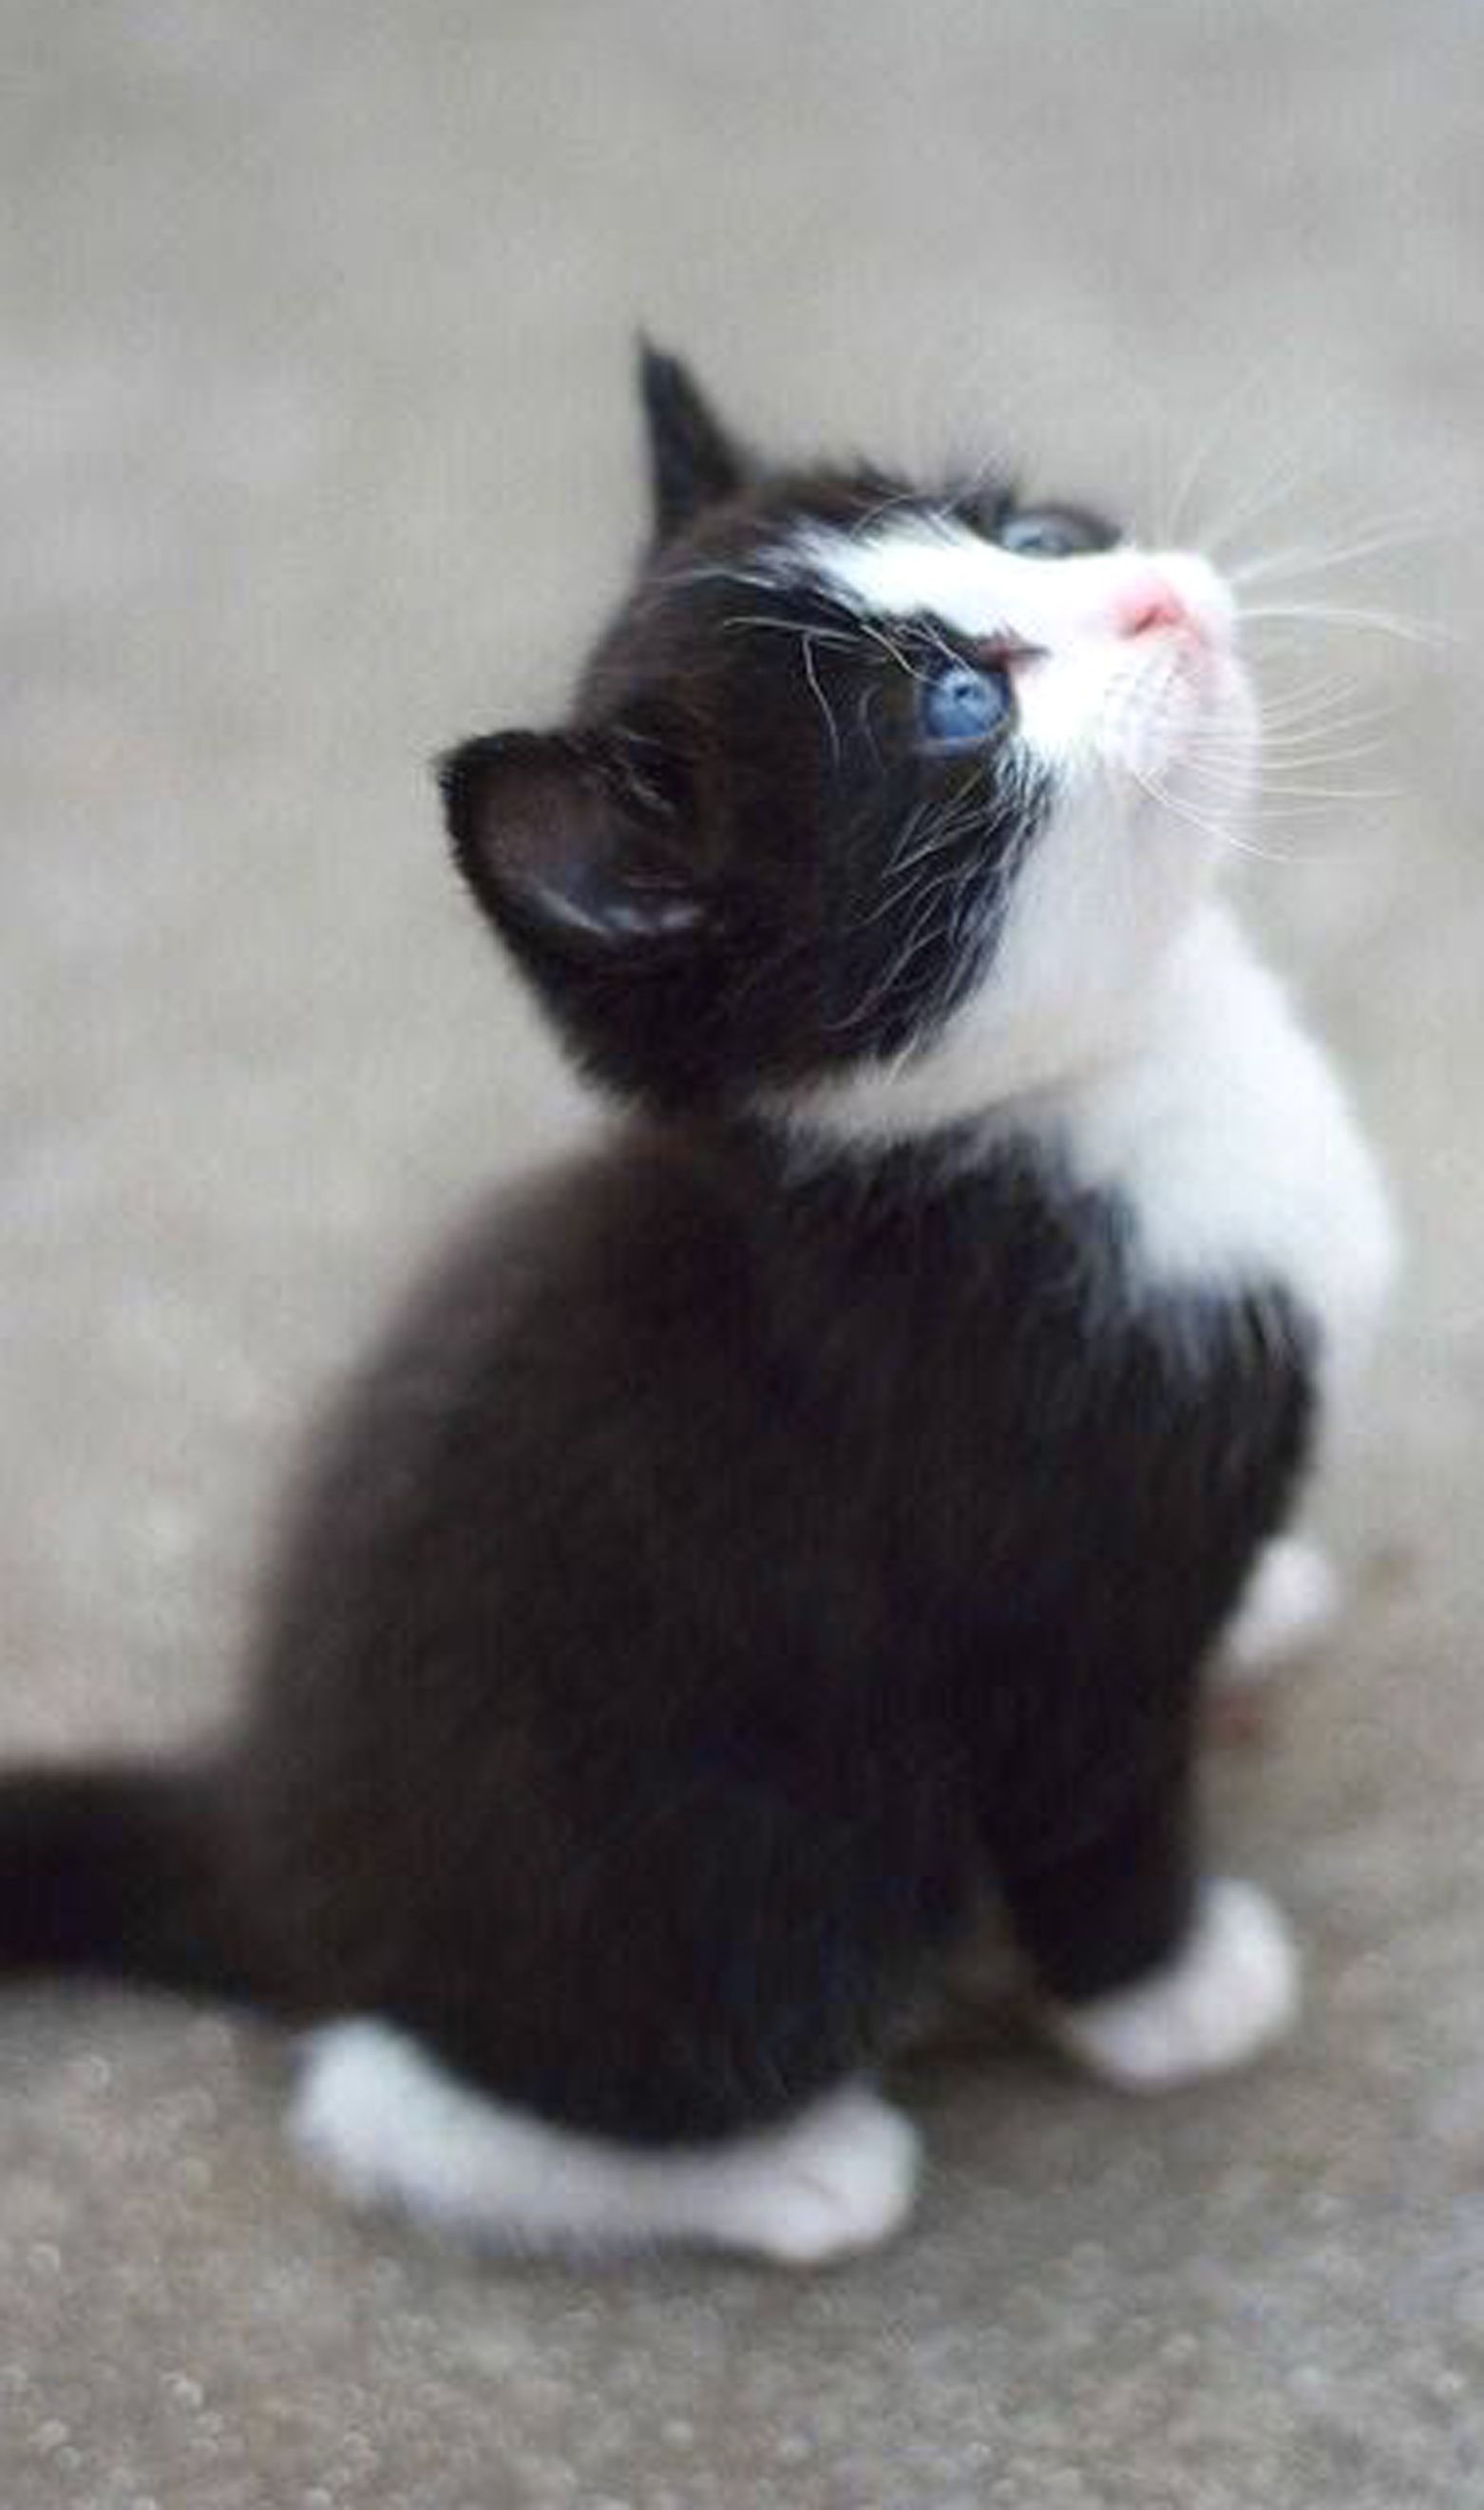 Pin by Chantel Erickson on Best Cat Photos Cats, Kittens